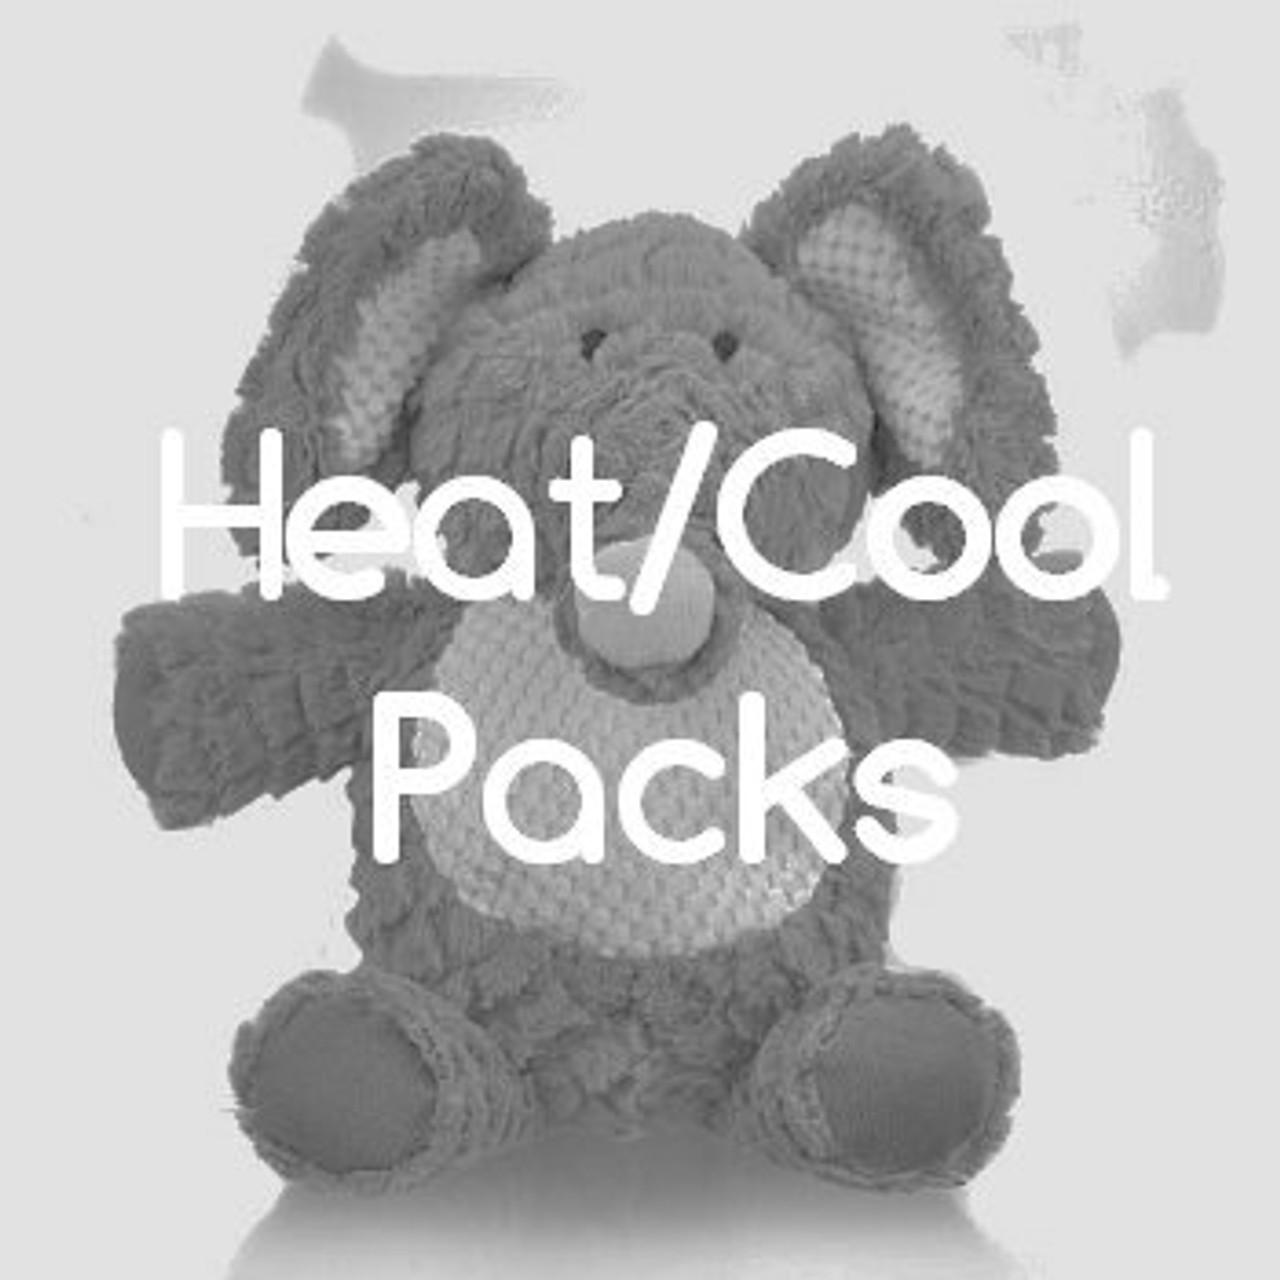 Heat + cool packs